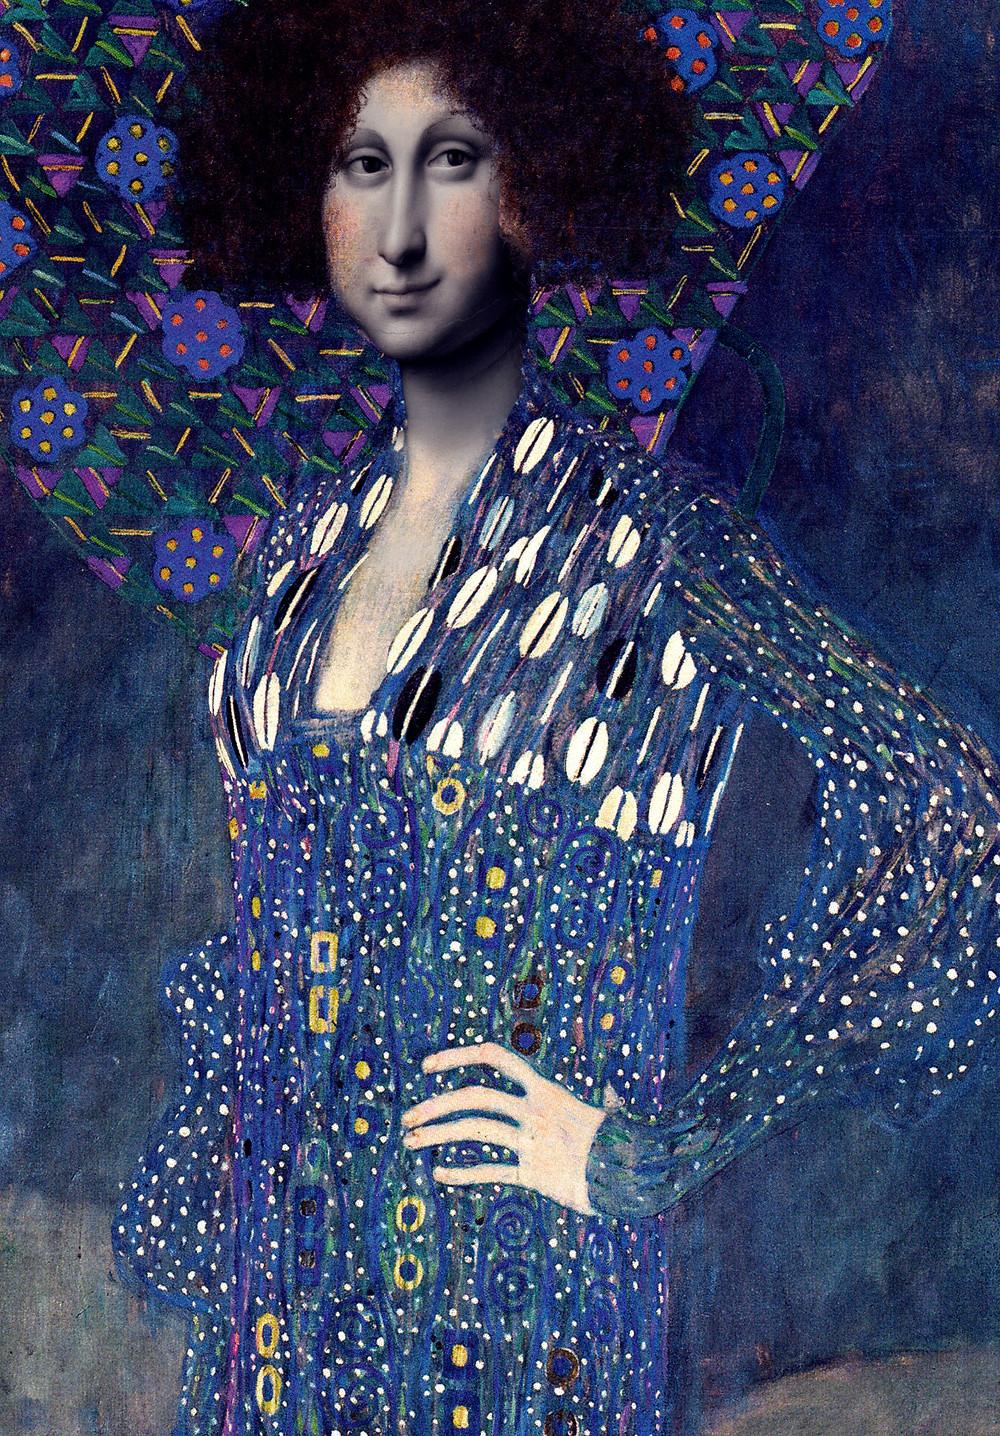 GIOCONDA IN BLUE, Alla Klimt Theme, Madrid 2014 by danIzvernariu.